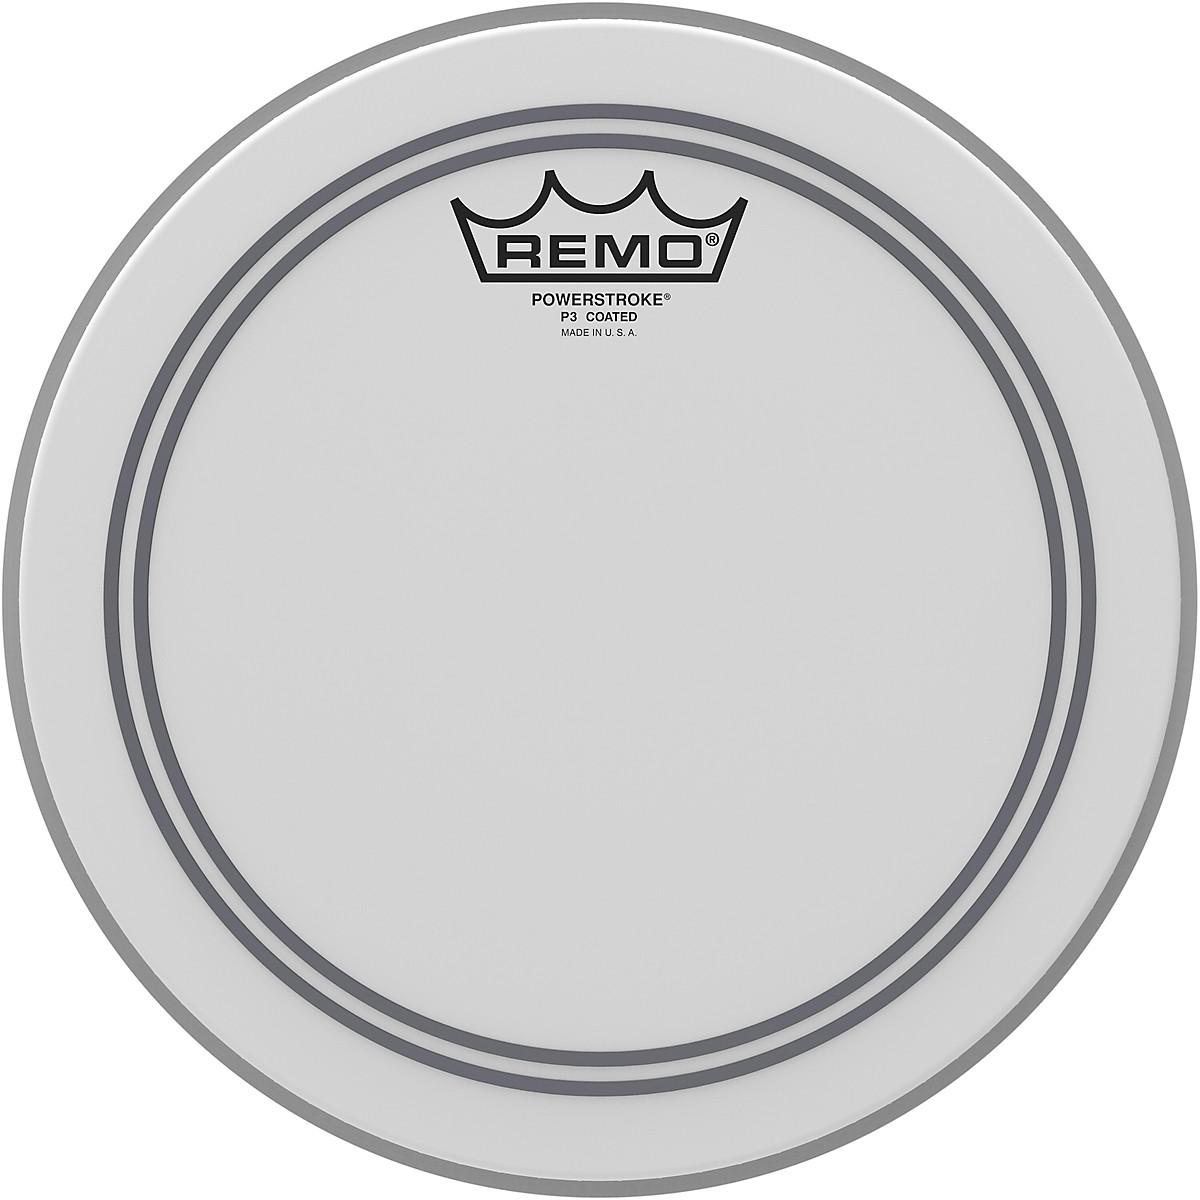 Remo Coated Powerstroke 3 Batter Head